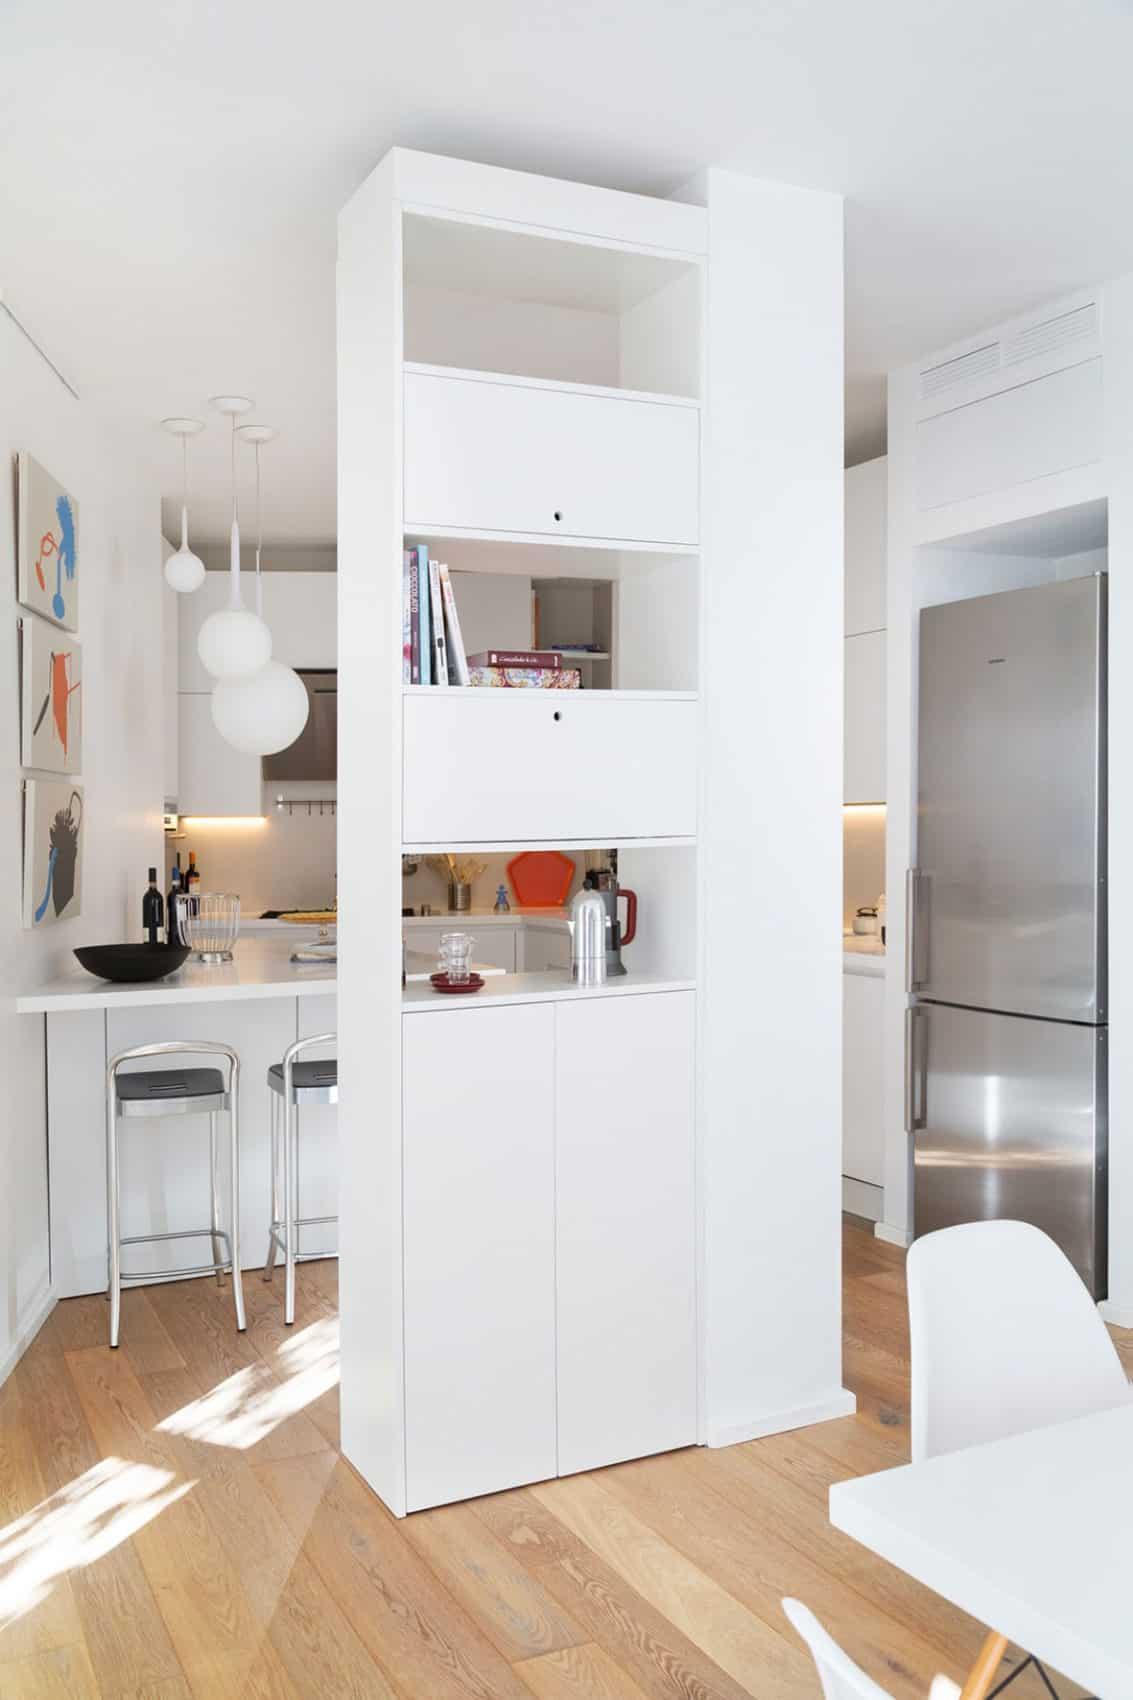 La Casa Studio by teresa paratore (4)